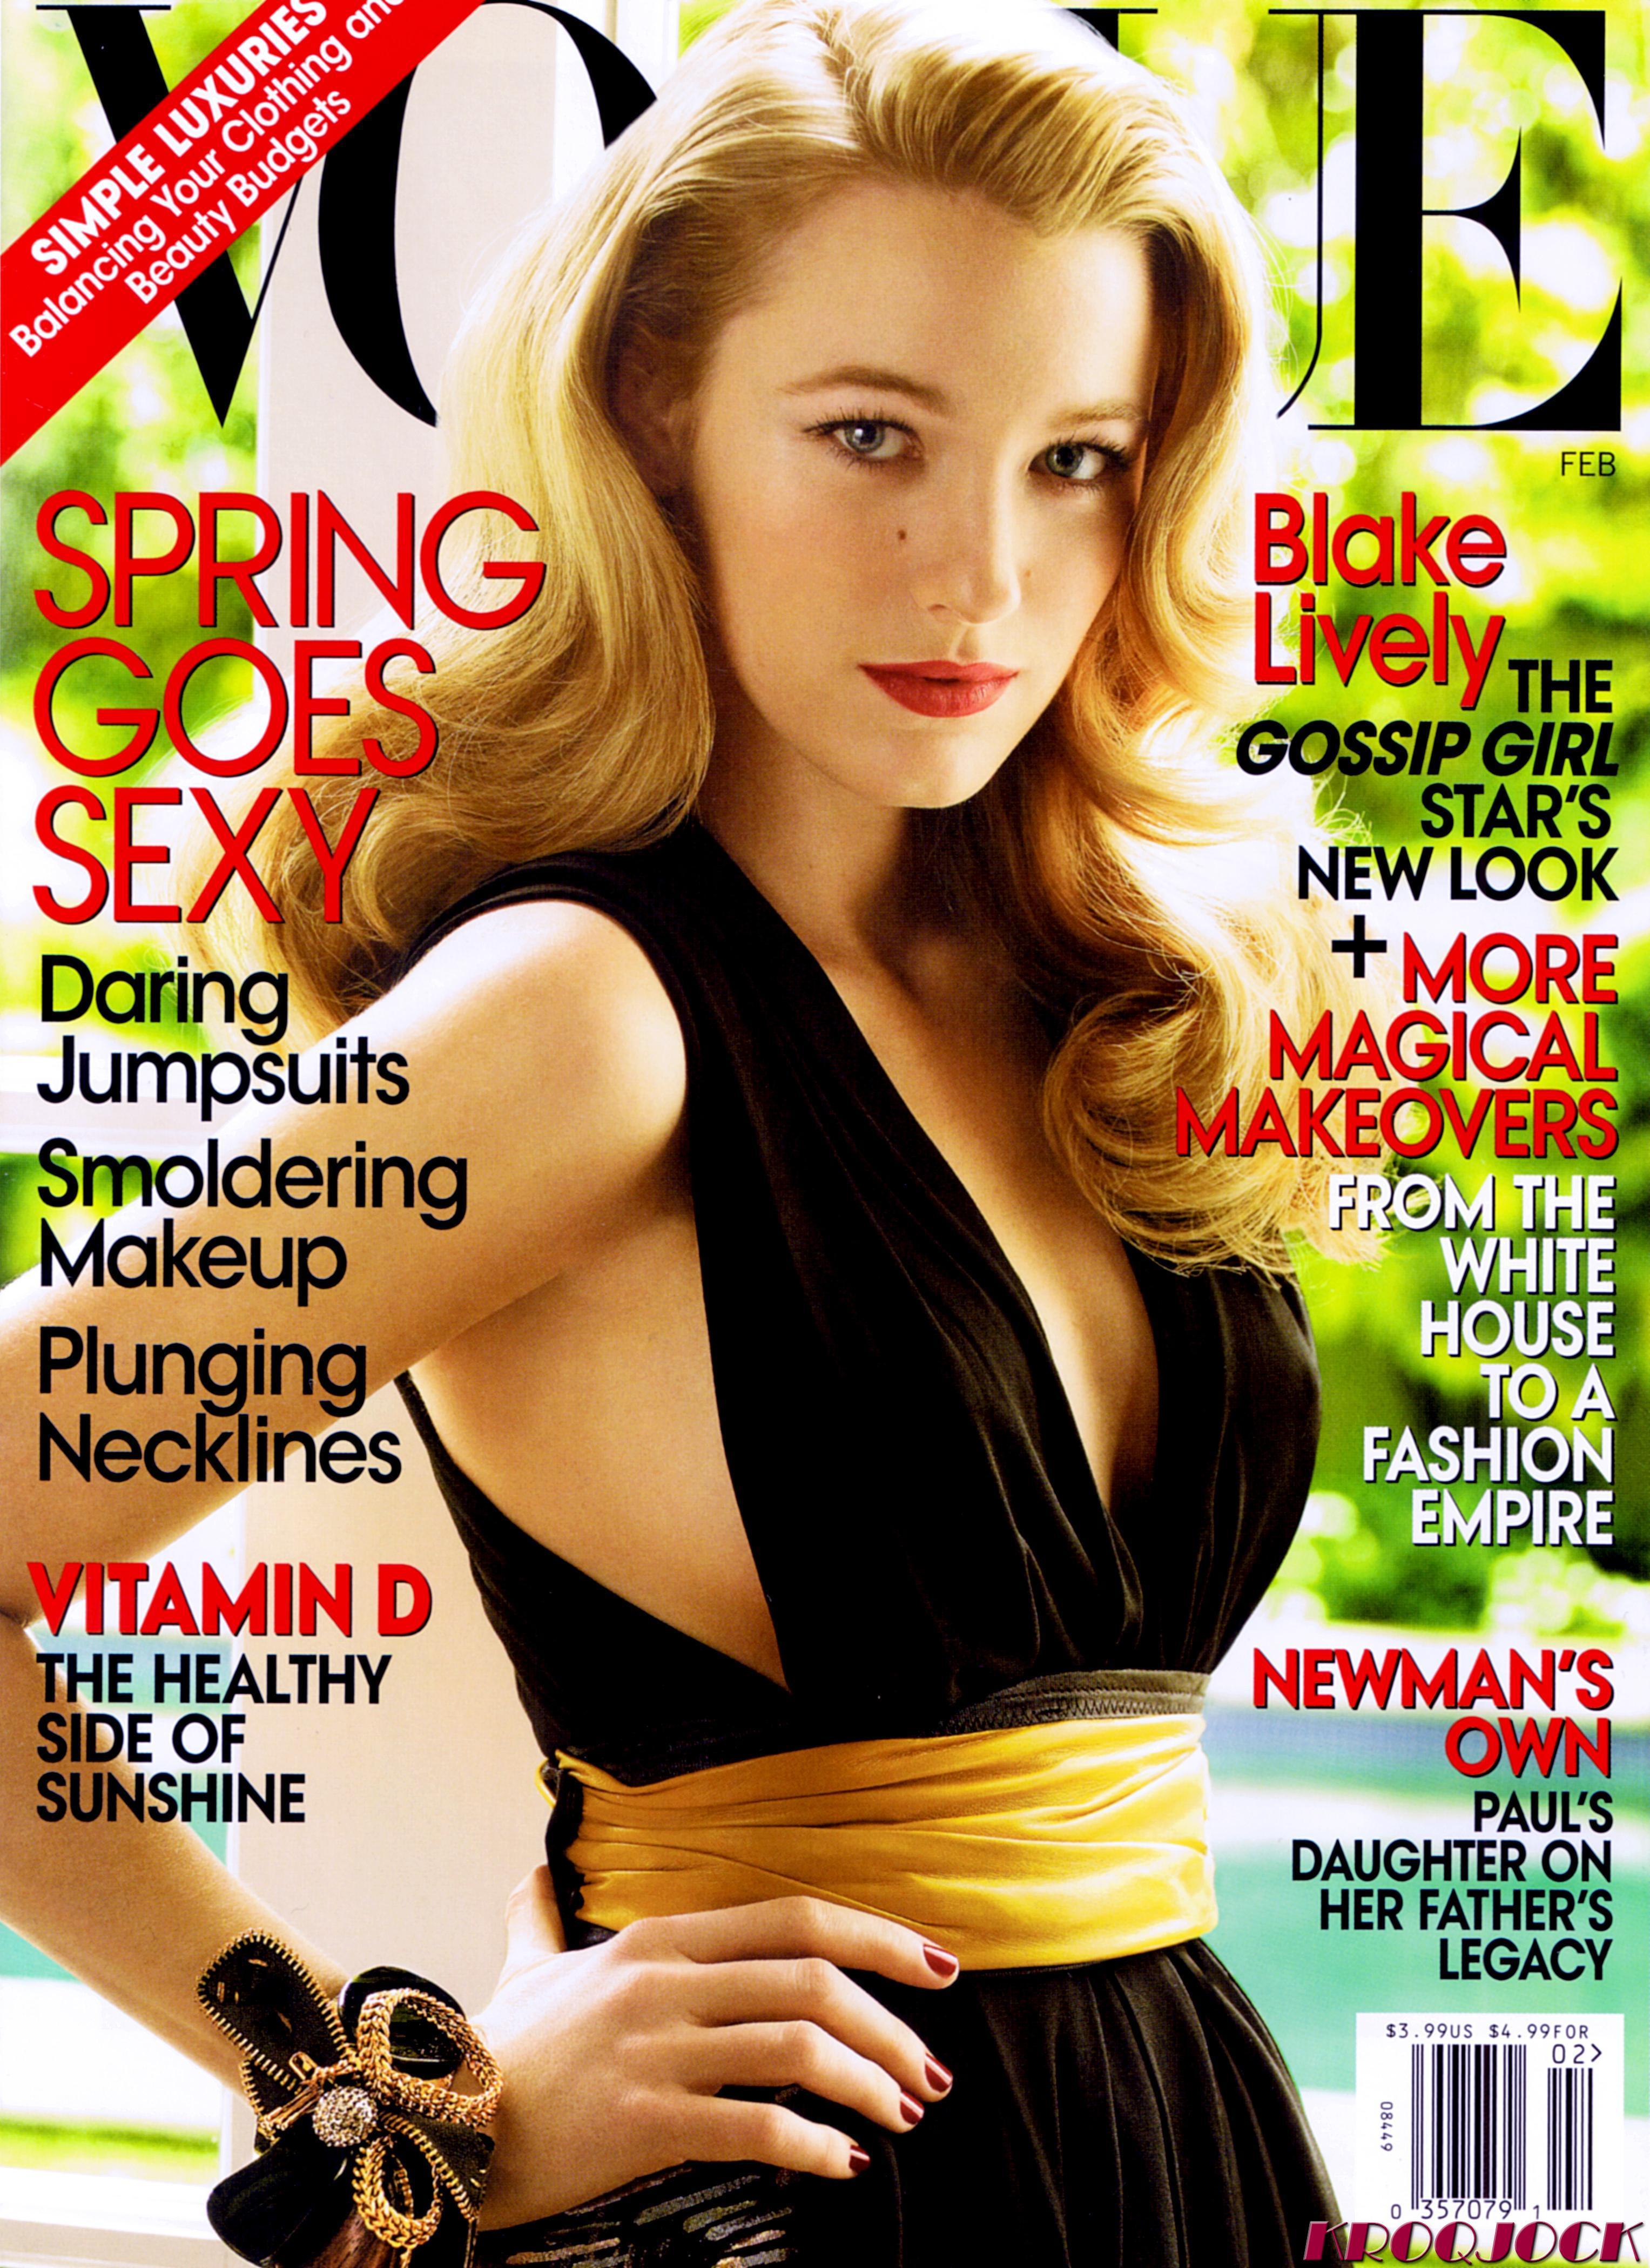 19004_Blake_Lively_Vogue_February_2009_01_122_232lo.jpg